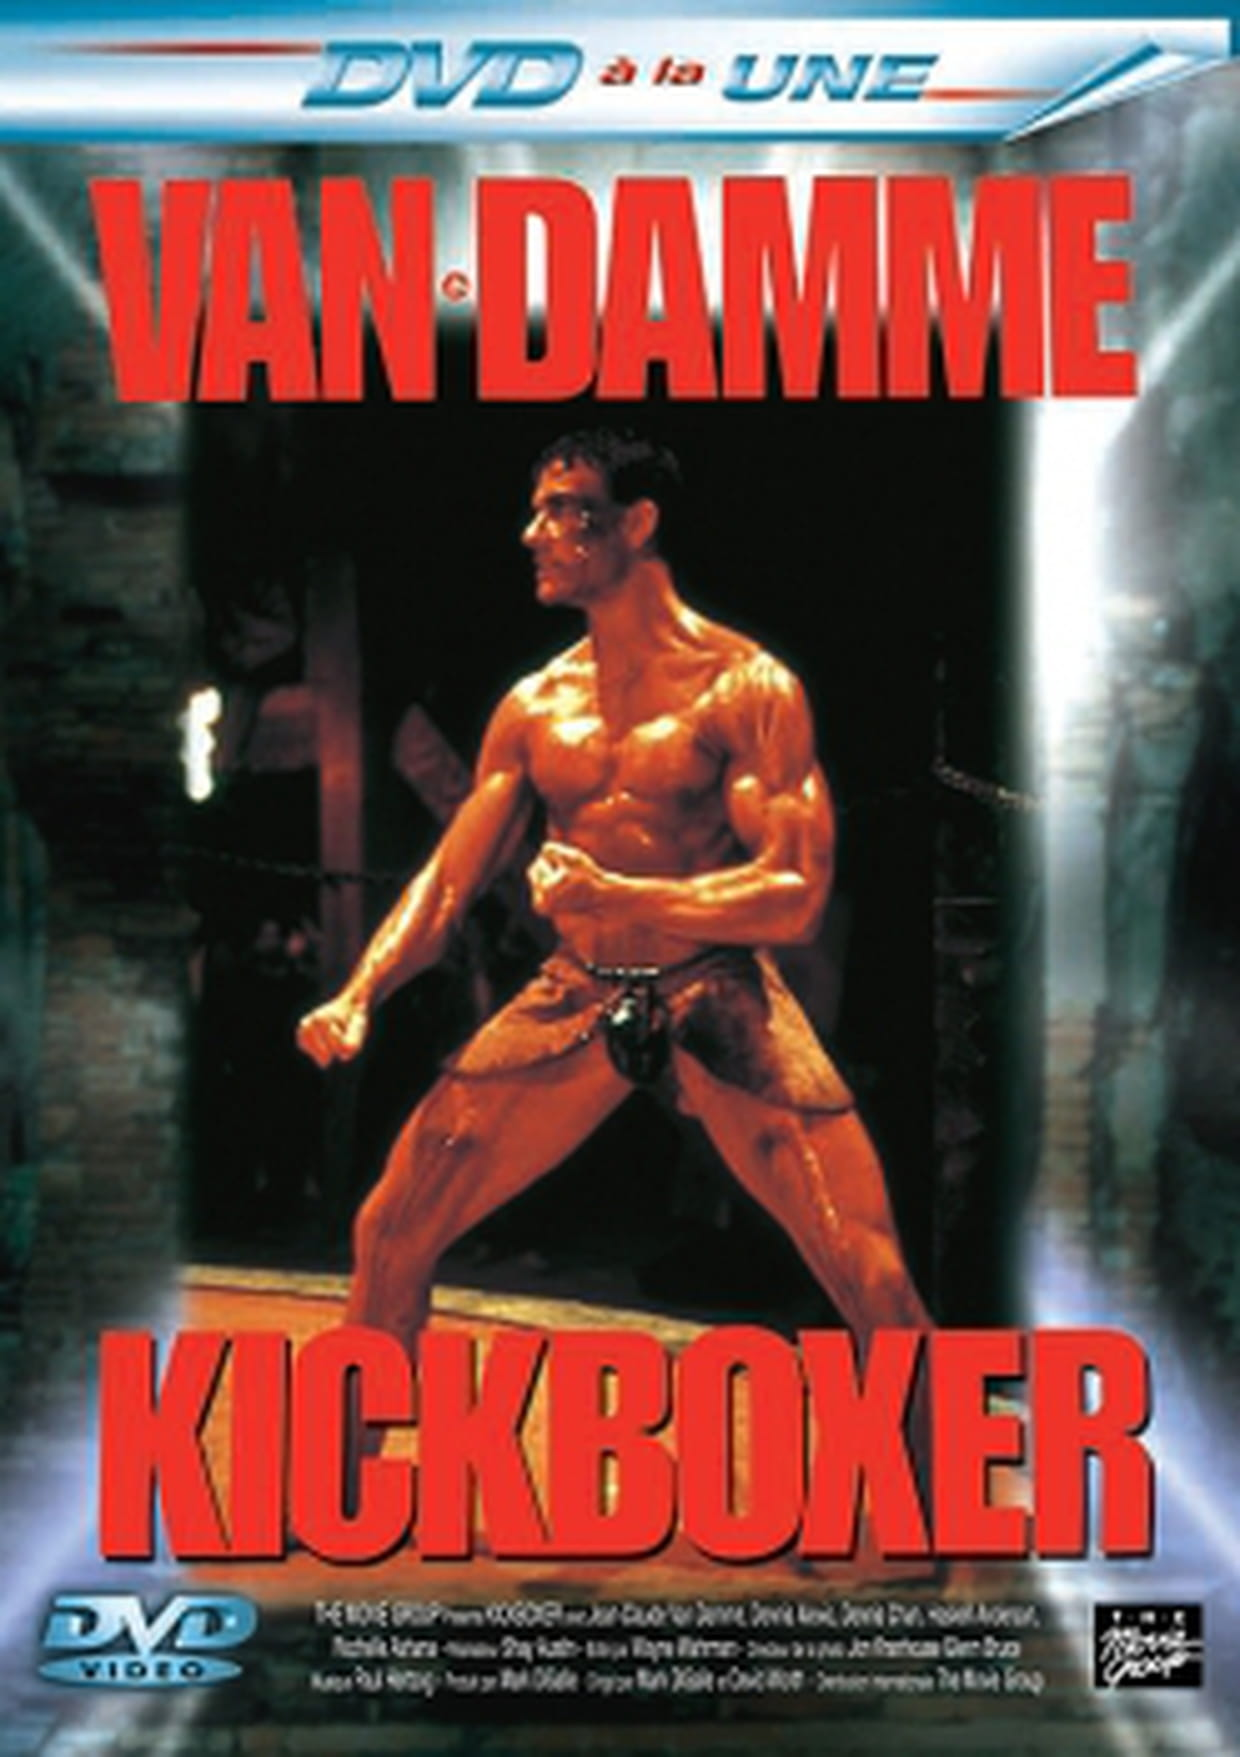 Kickbokser Film